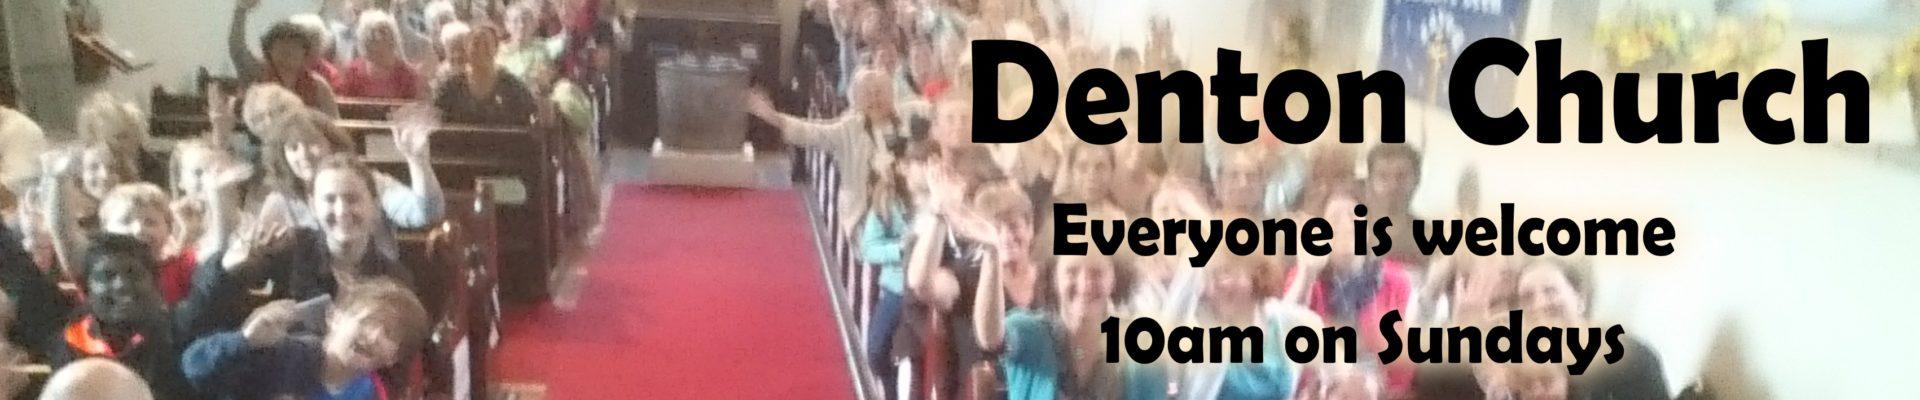 Denton Church